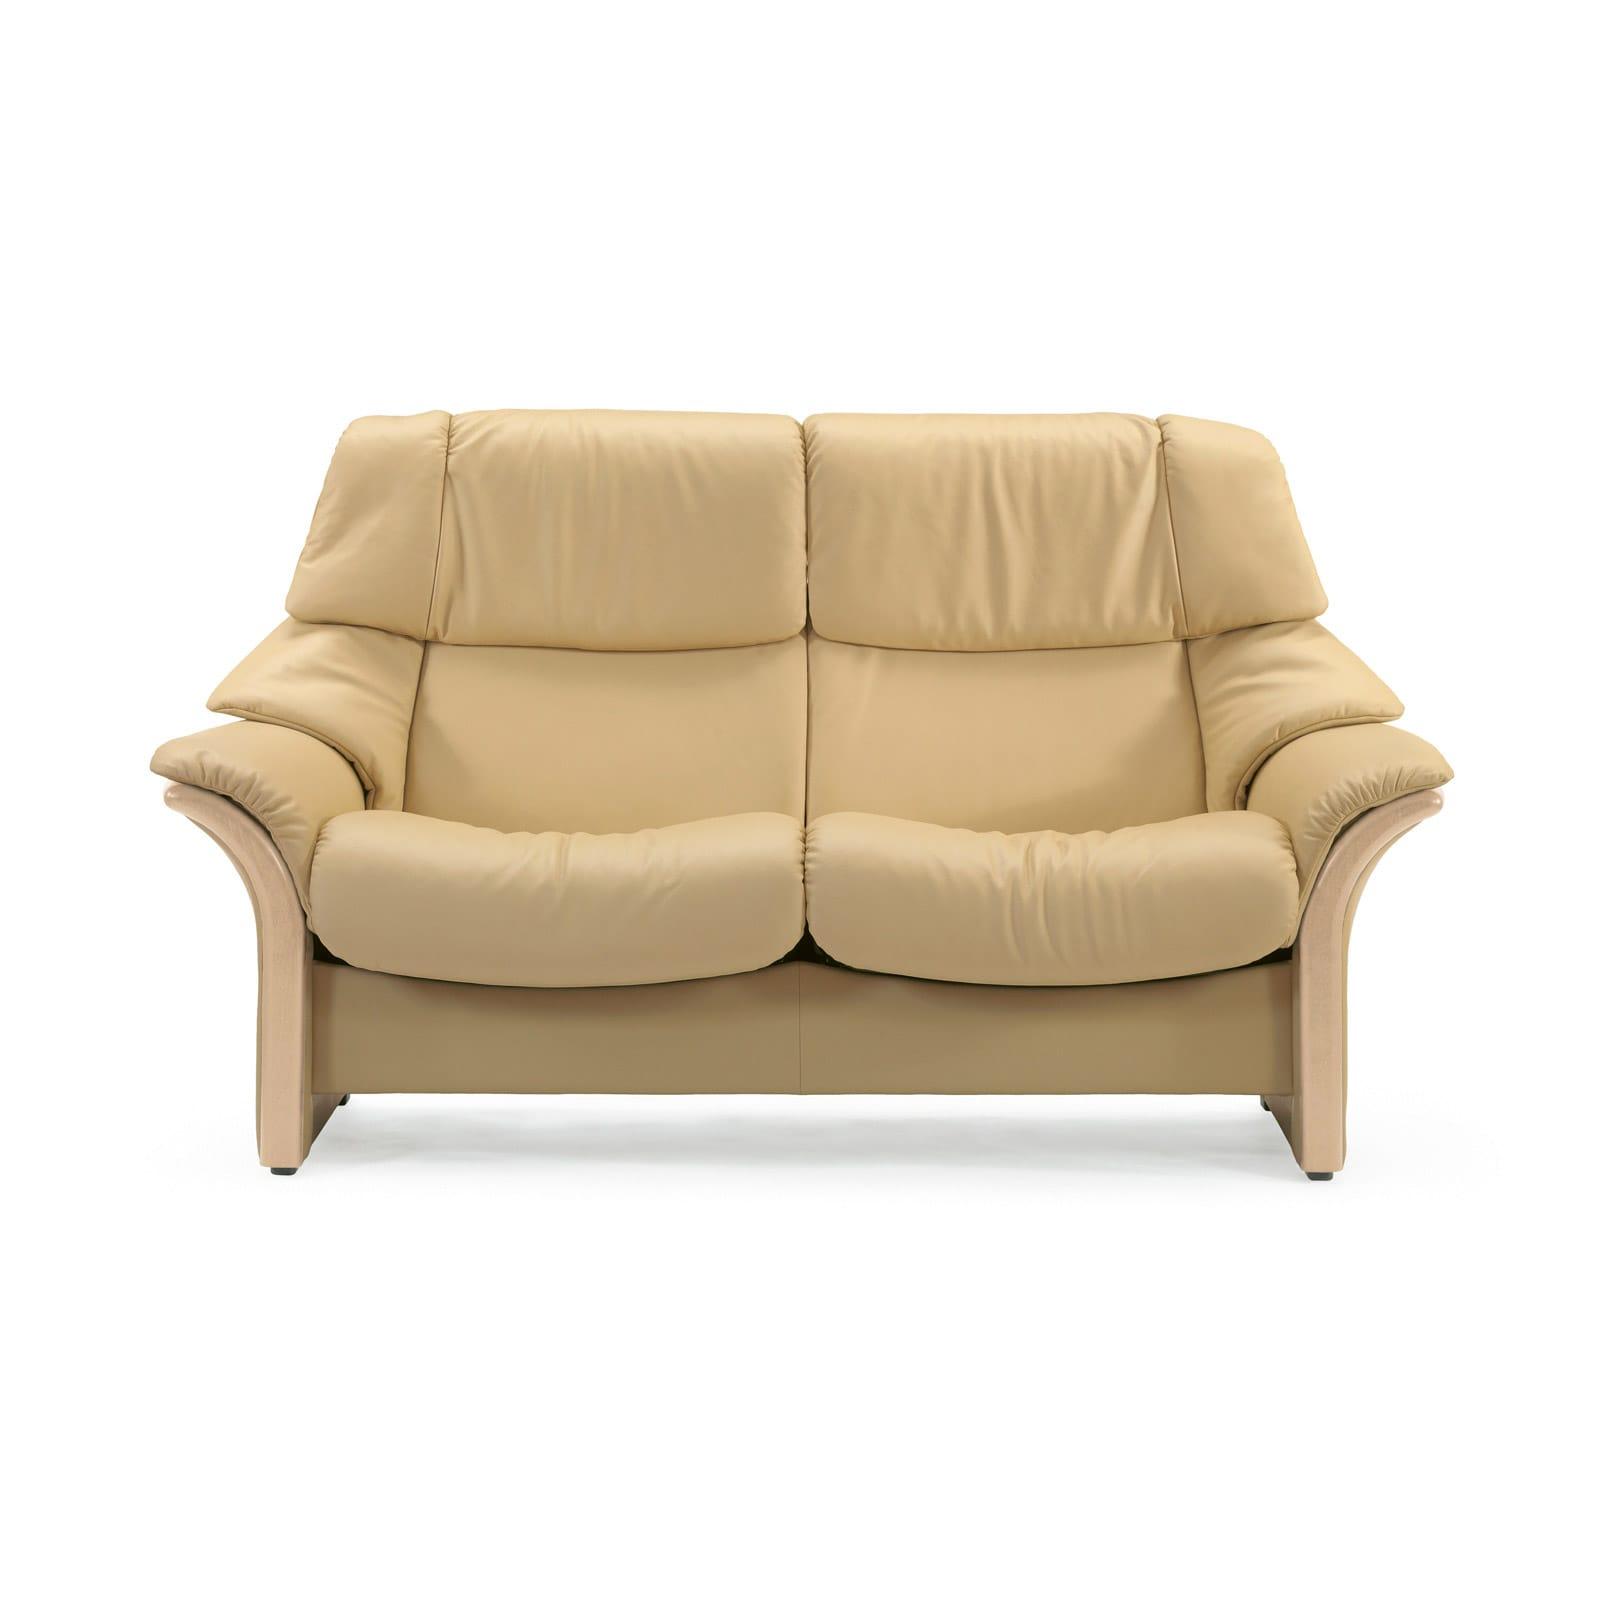 stressless eldorado preise stressless sofa 2 sitzer. Black Bedroom Furniture Sets. Home Design Ideas